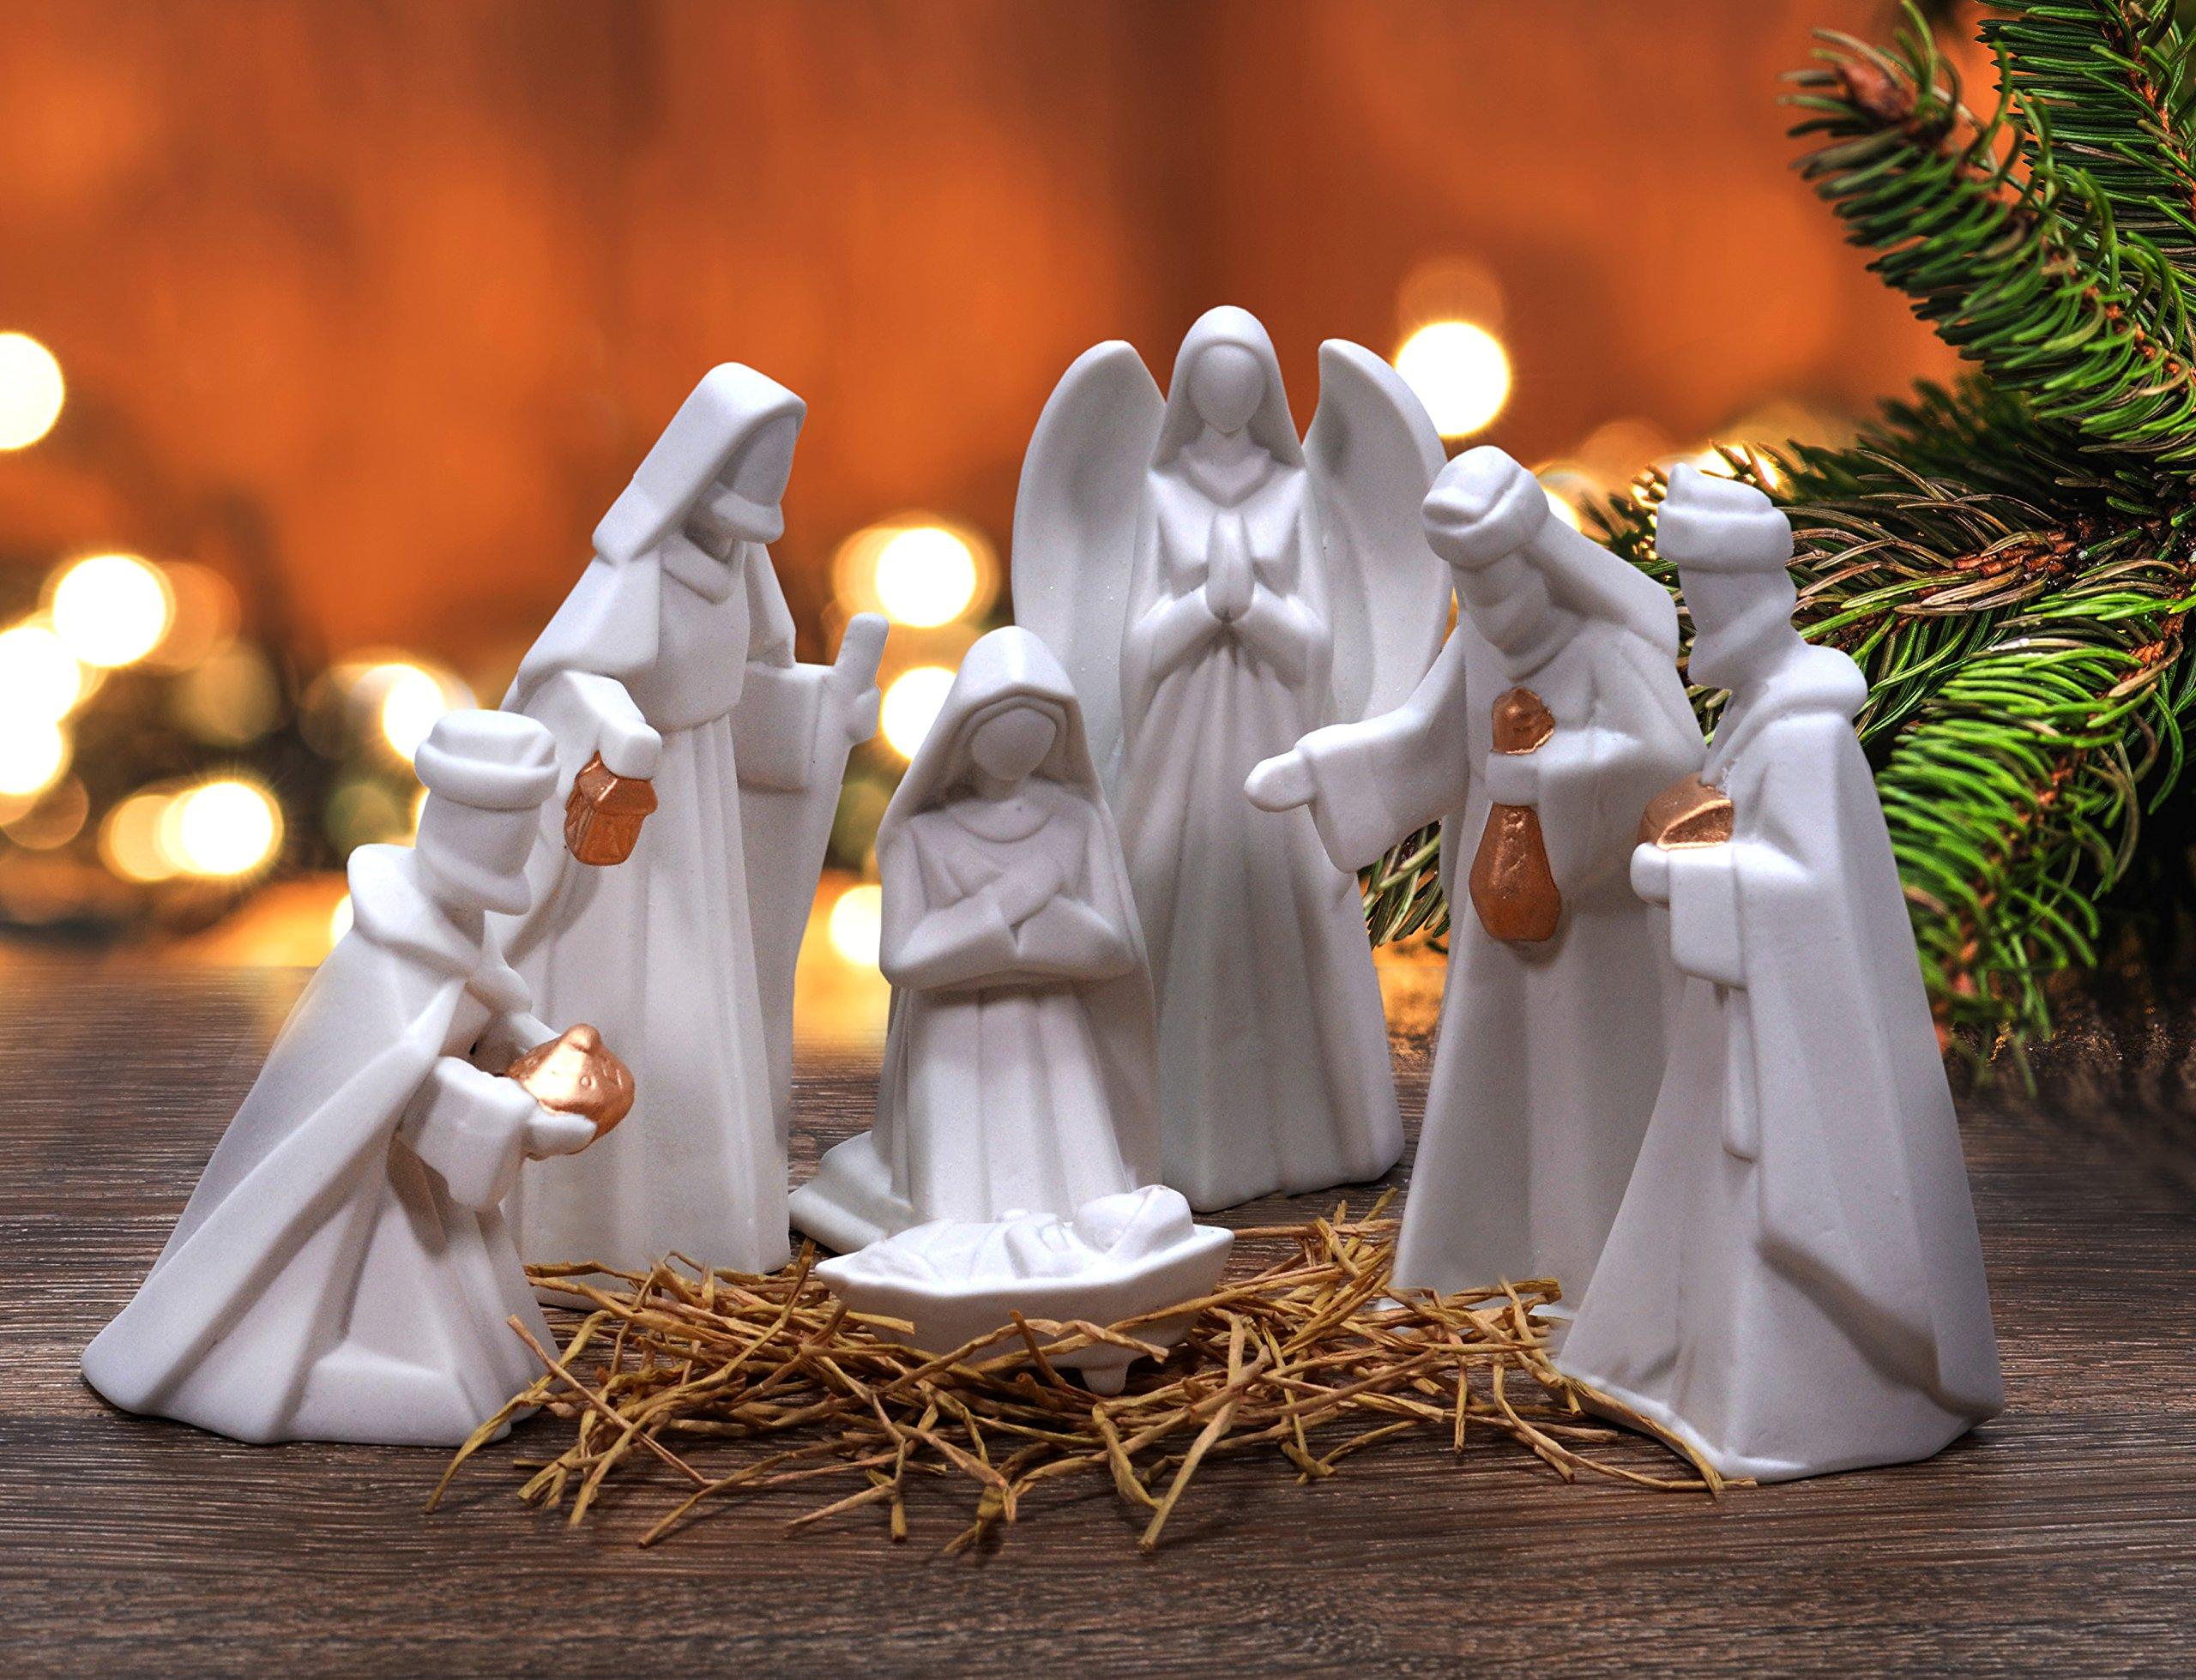 Mark Feldstein White Porcelain 7 PC Hand Painted Miniature Christmas Nativity Set, Boxed